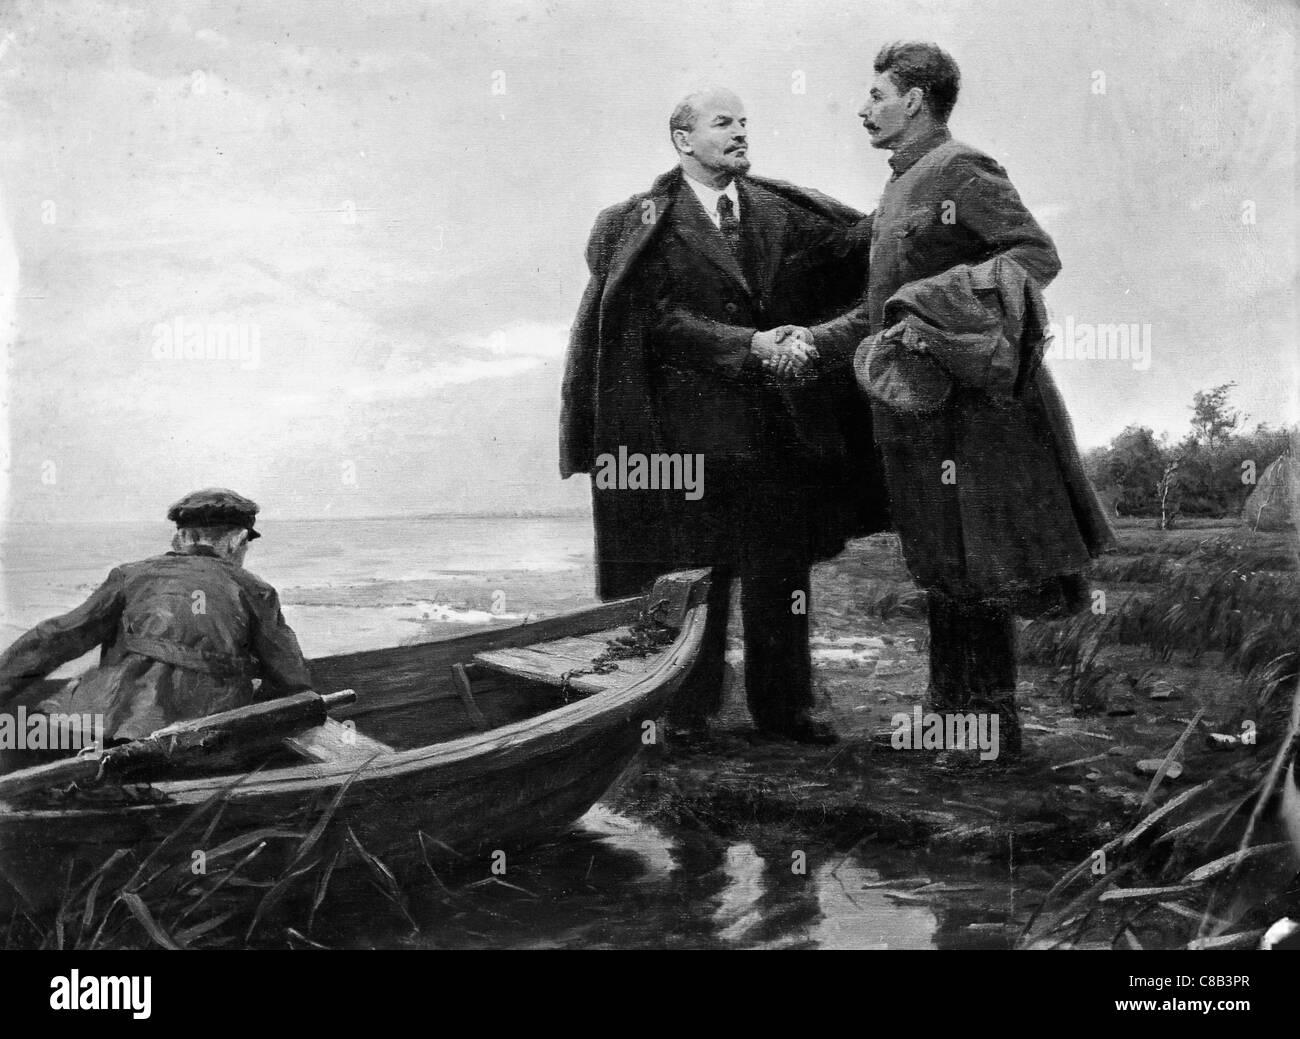 Vladimir Lenin and Iosif Stalin - Stock Image